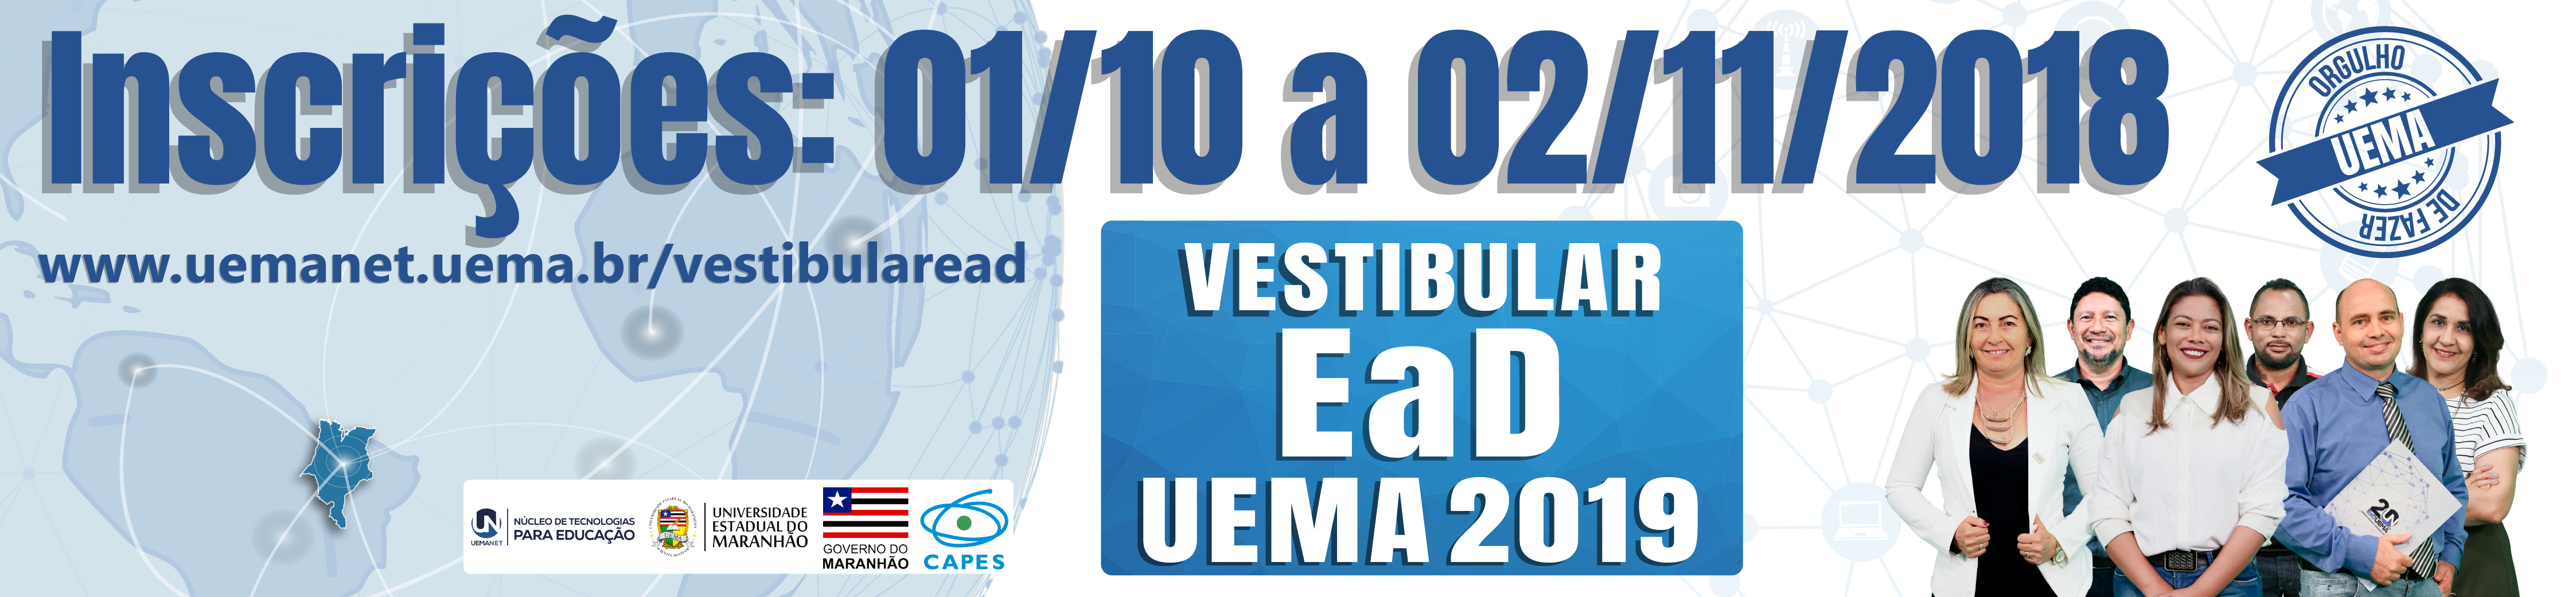 banner-site-vestibular-ead-uema-2019